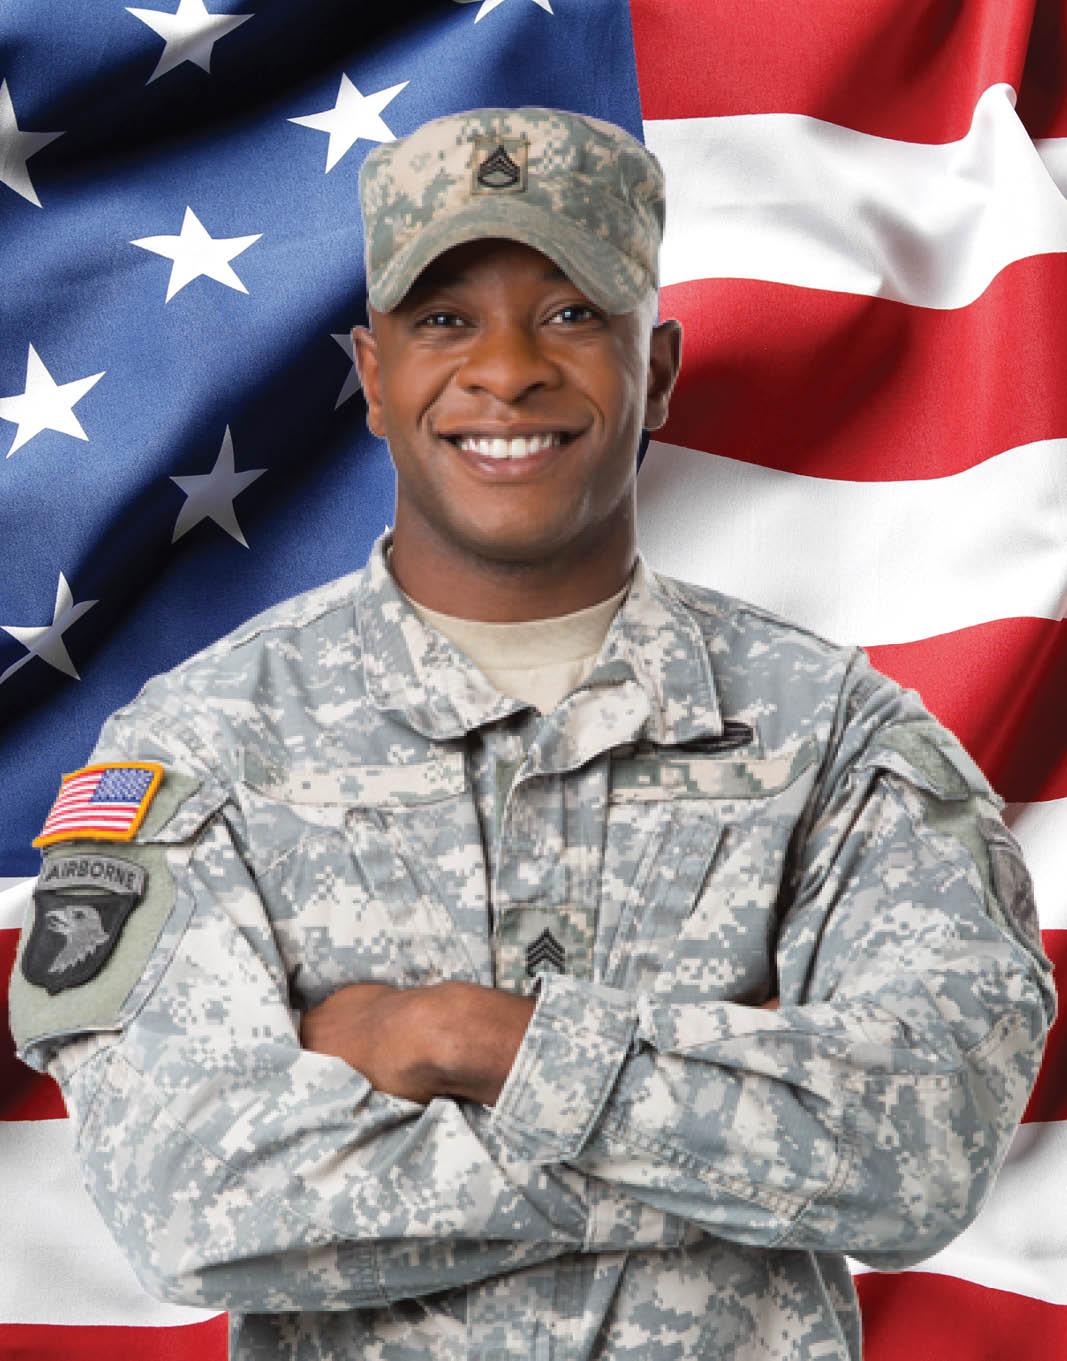 Our Consultants, U.S. Military Veterans